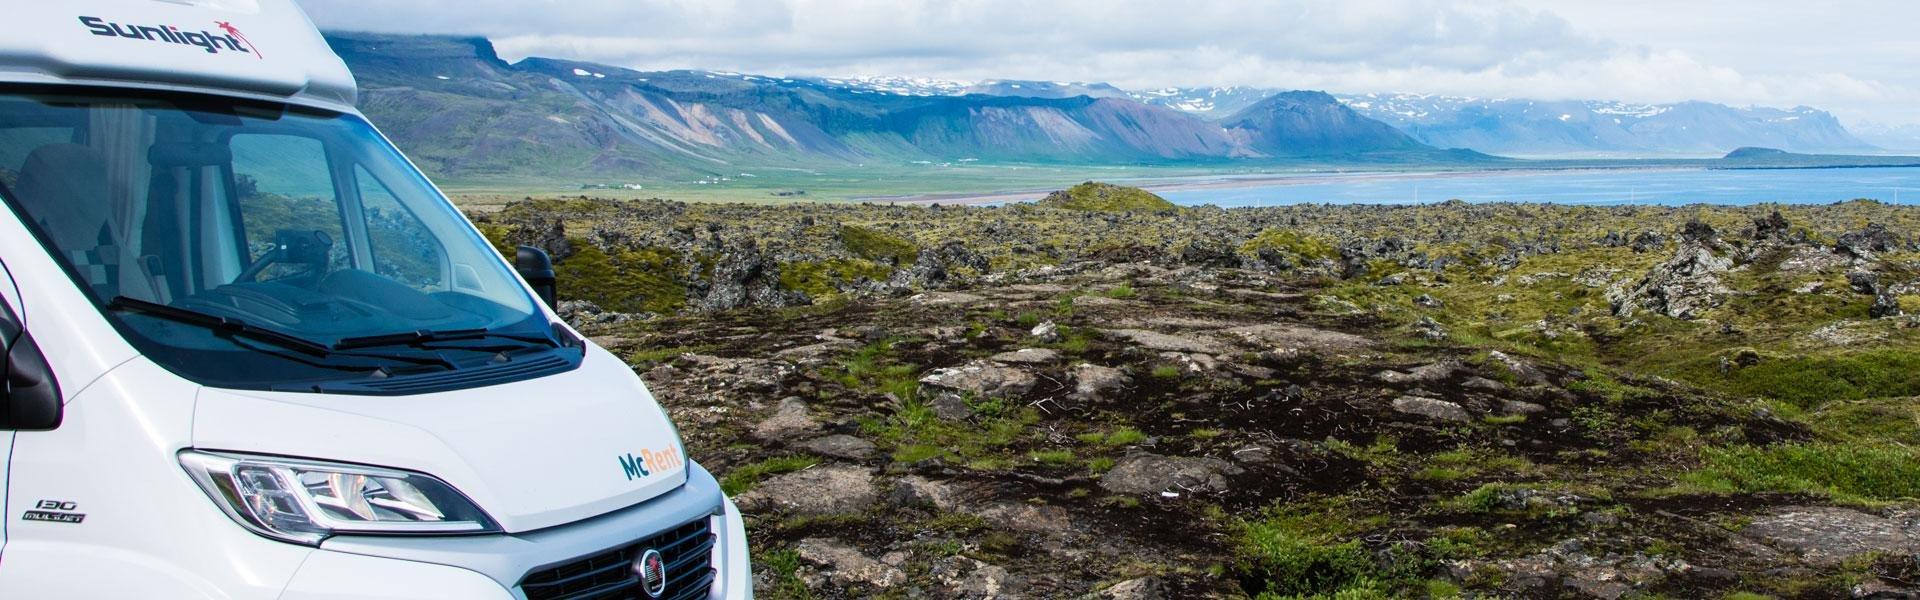 McRent IJsland